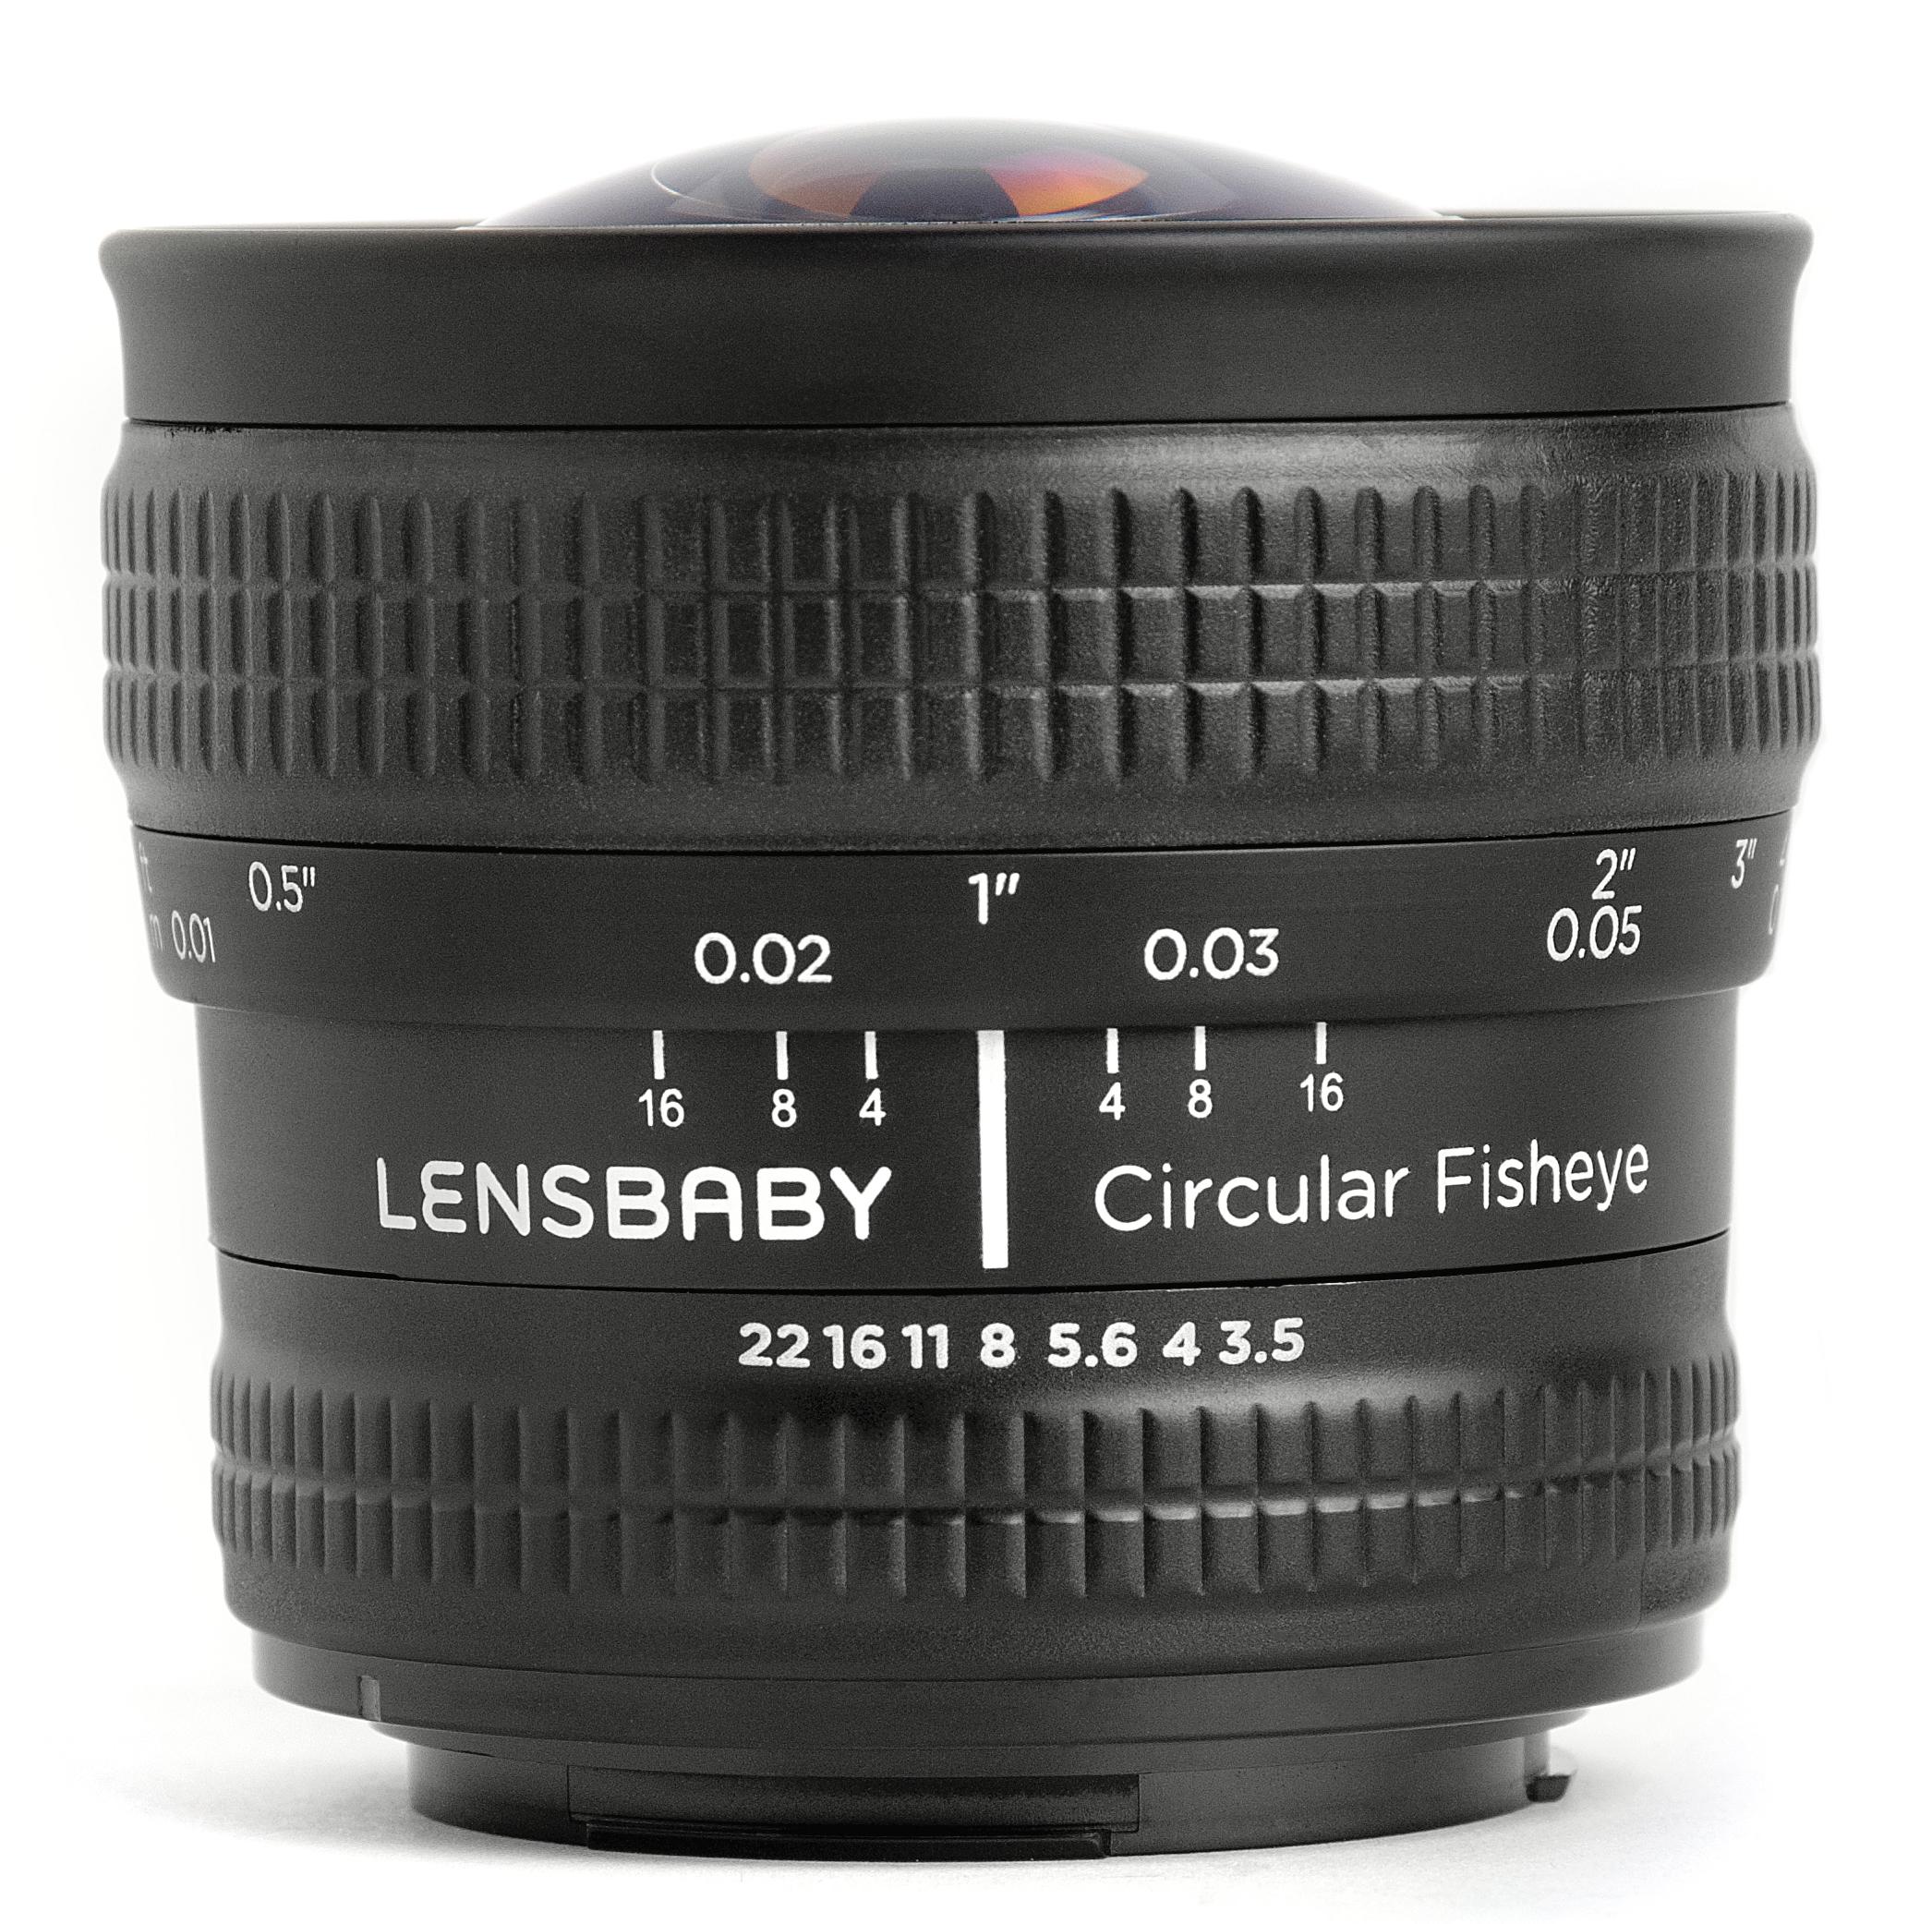 Lensbaby Circular Fisheye 5,8 mm f3.5 halszem objektív